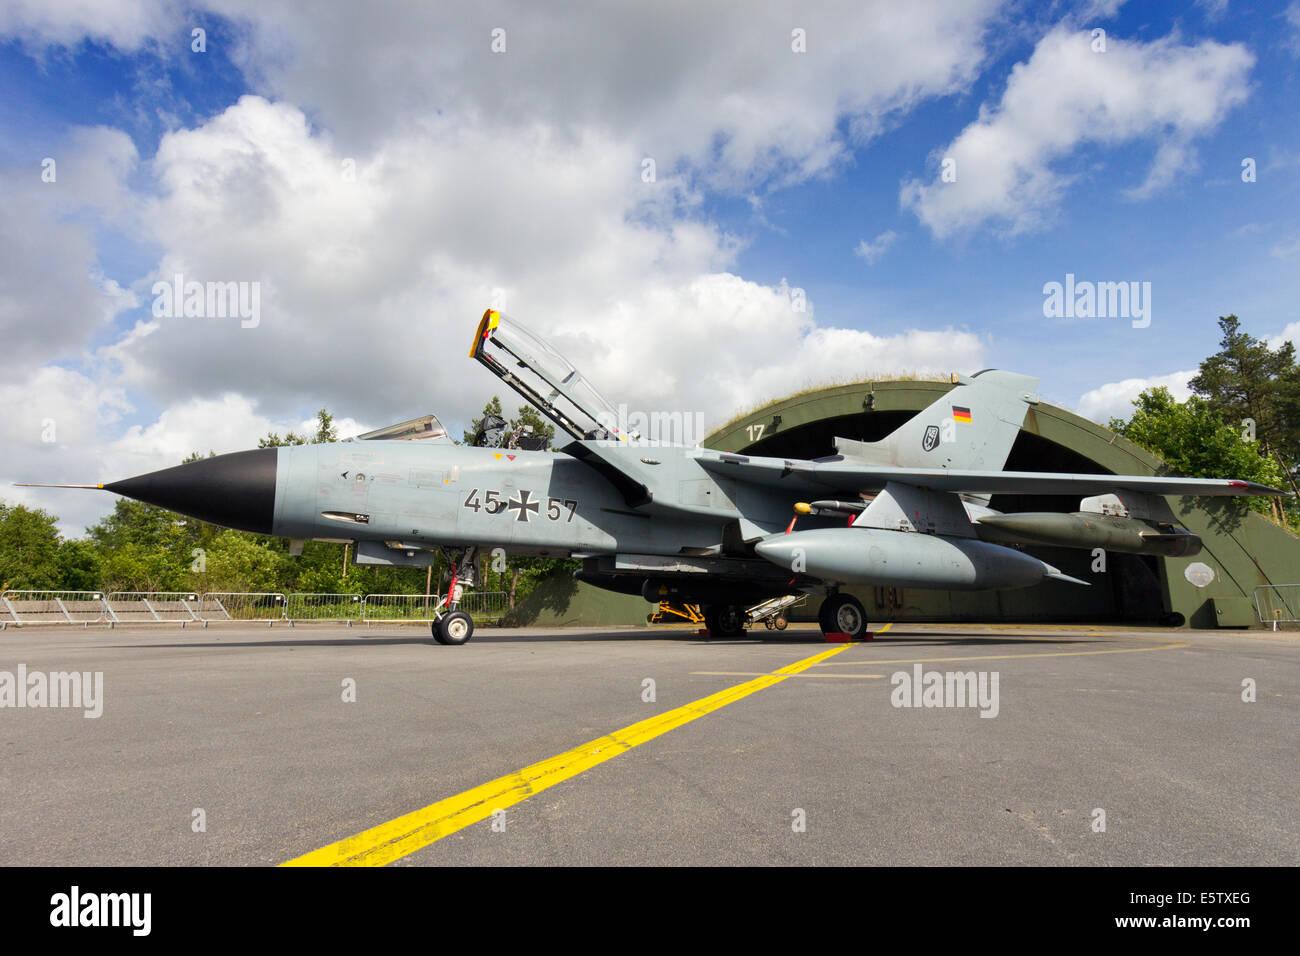 German Air Force Tornado fighter jet - Stock Image